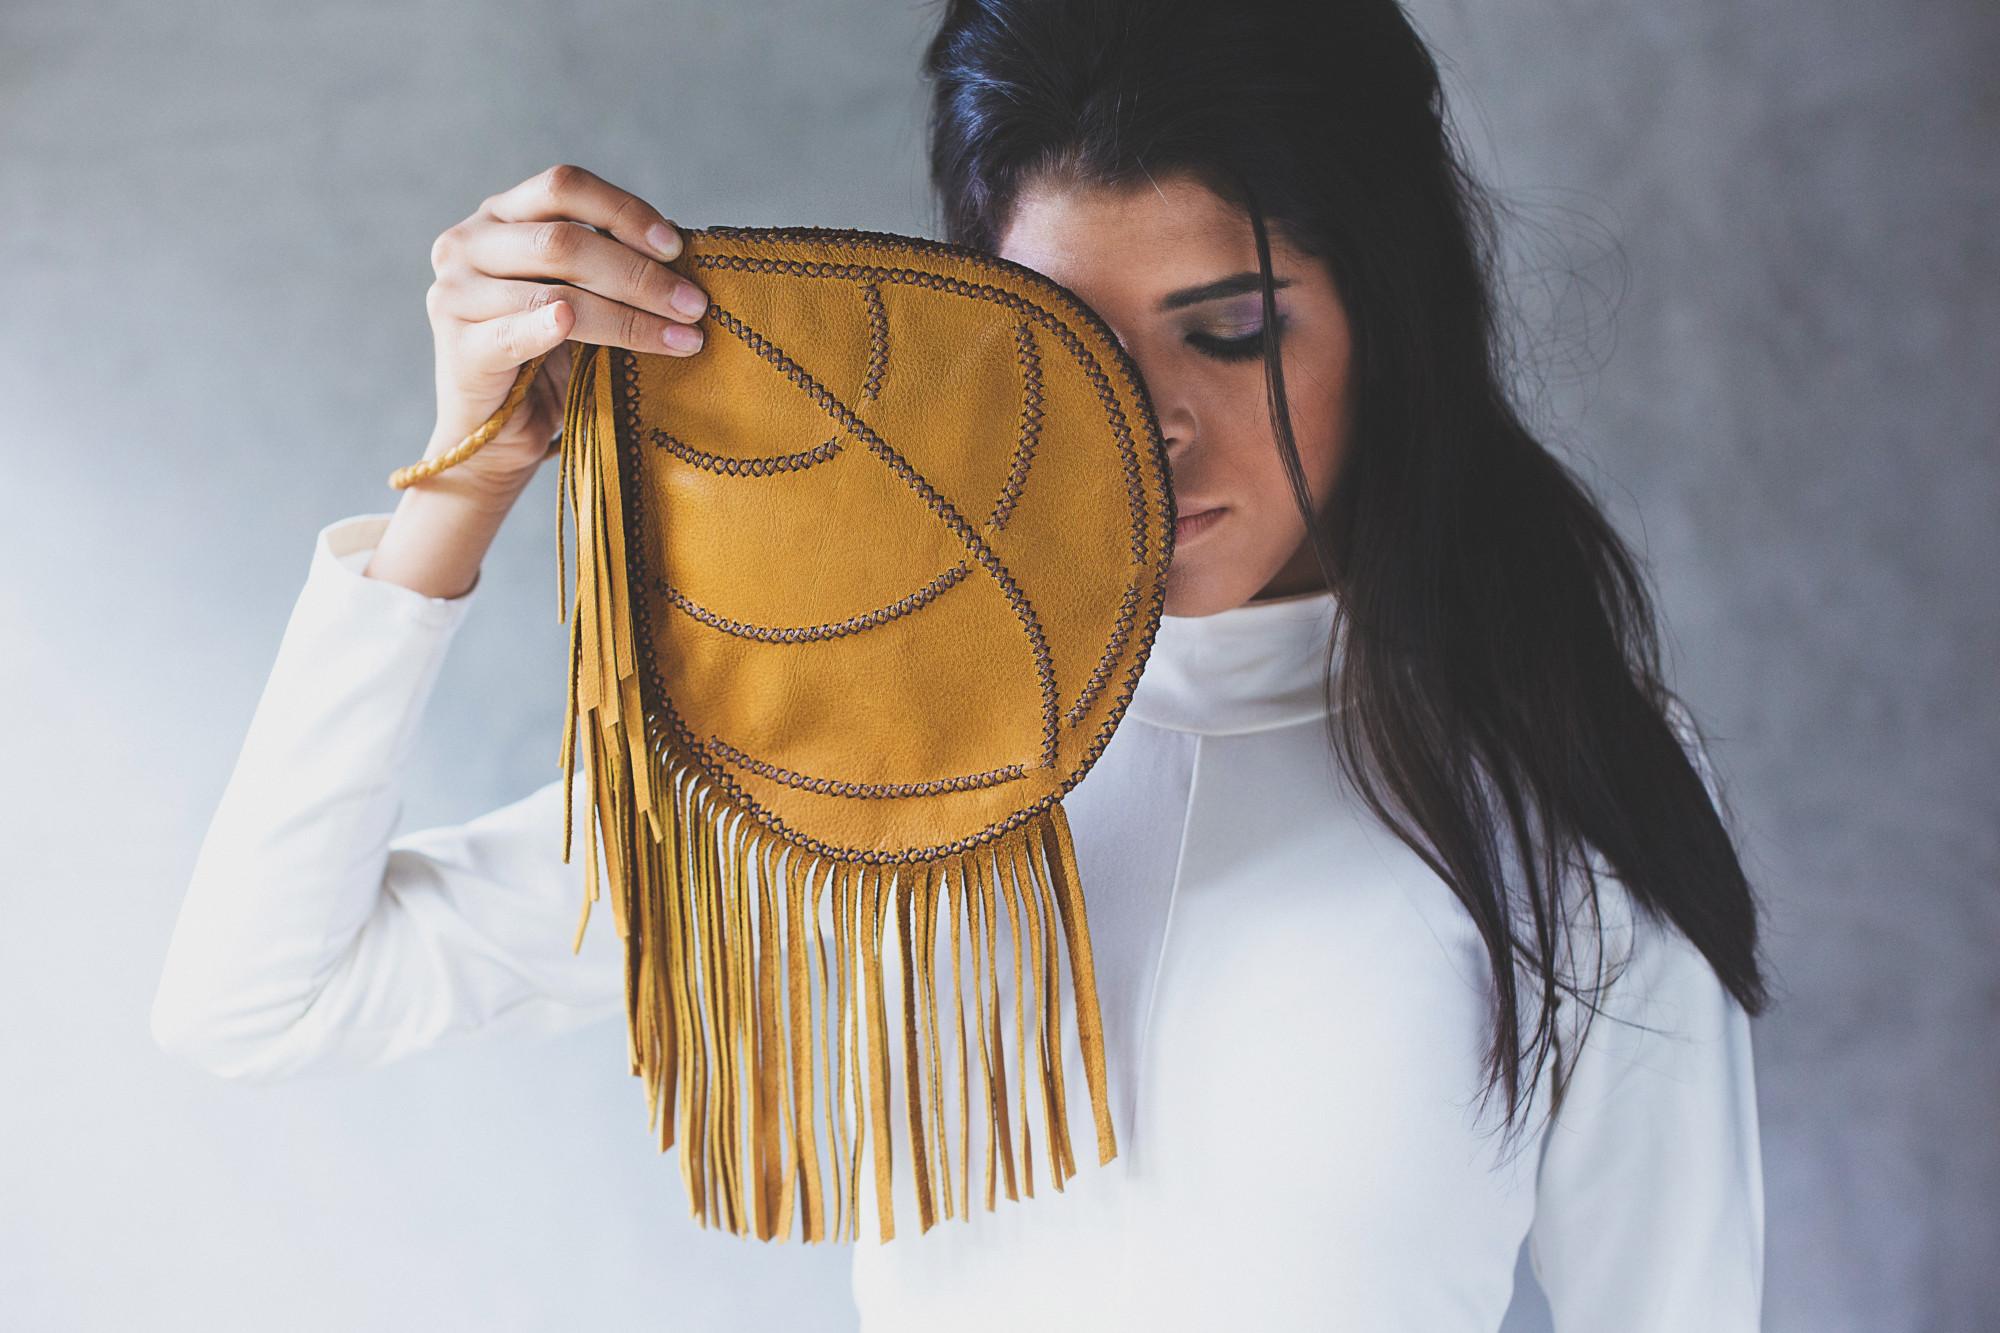 Kuero handbag